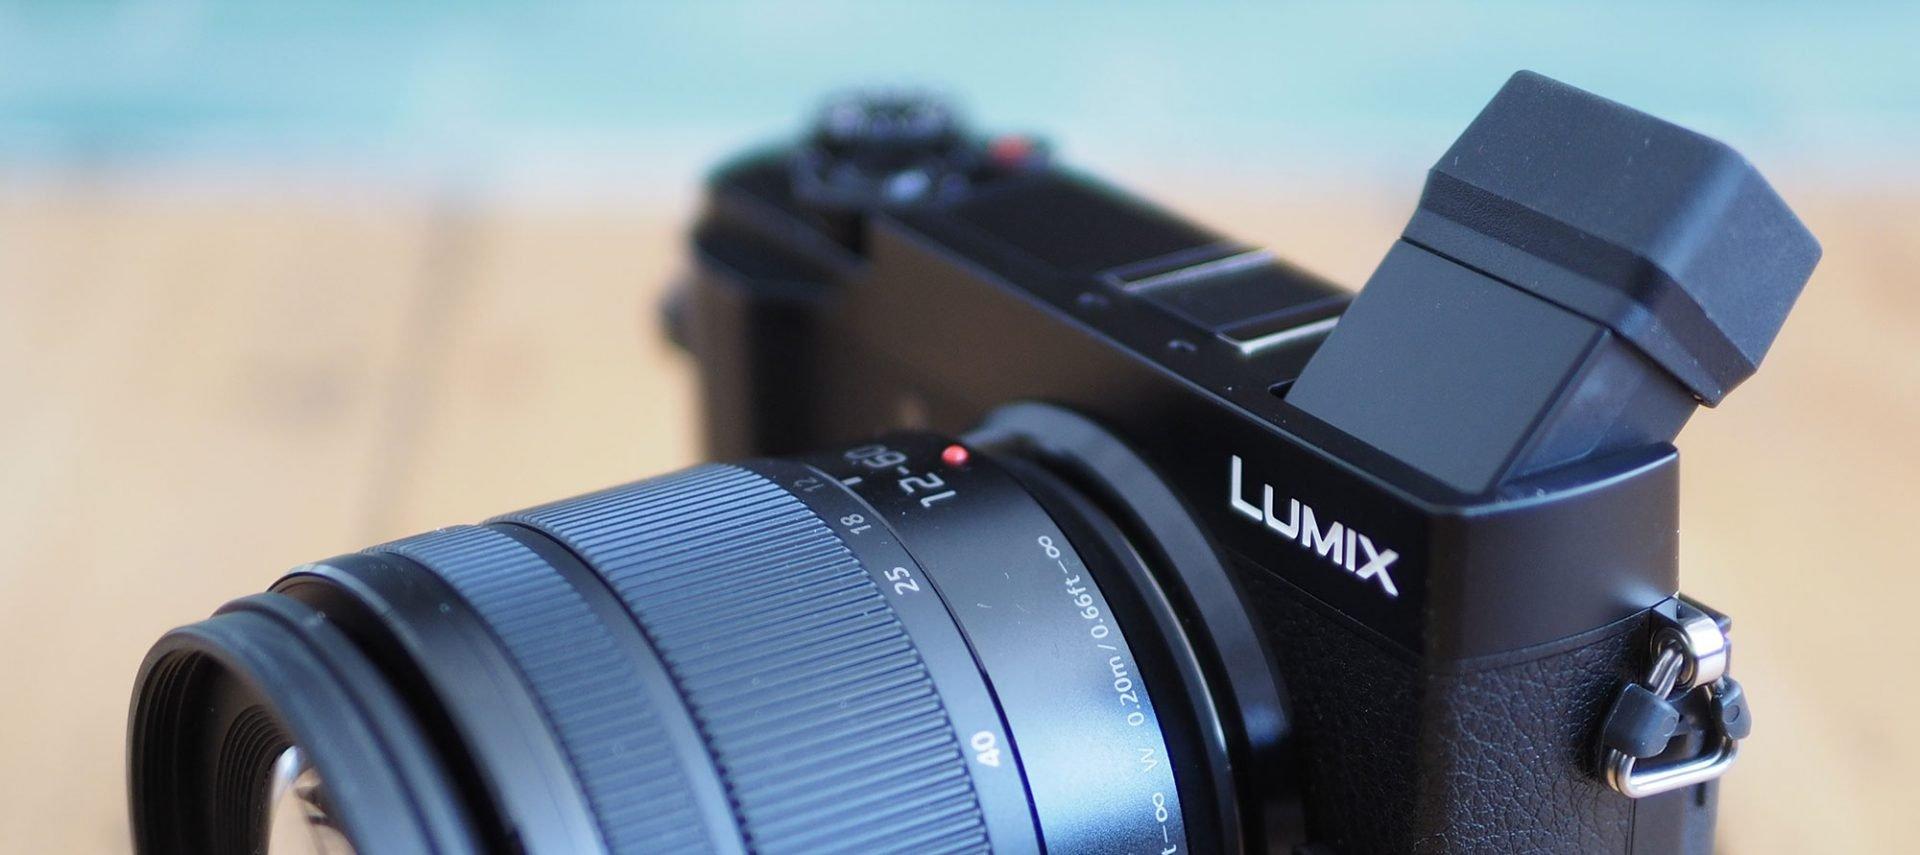 panasonic-lumix-gx9-header2